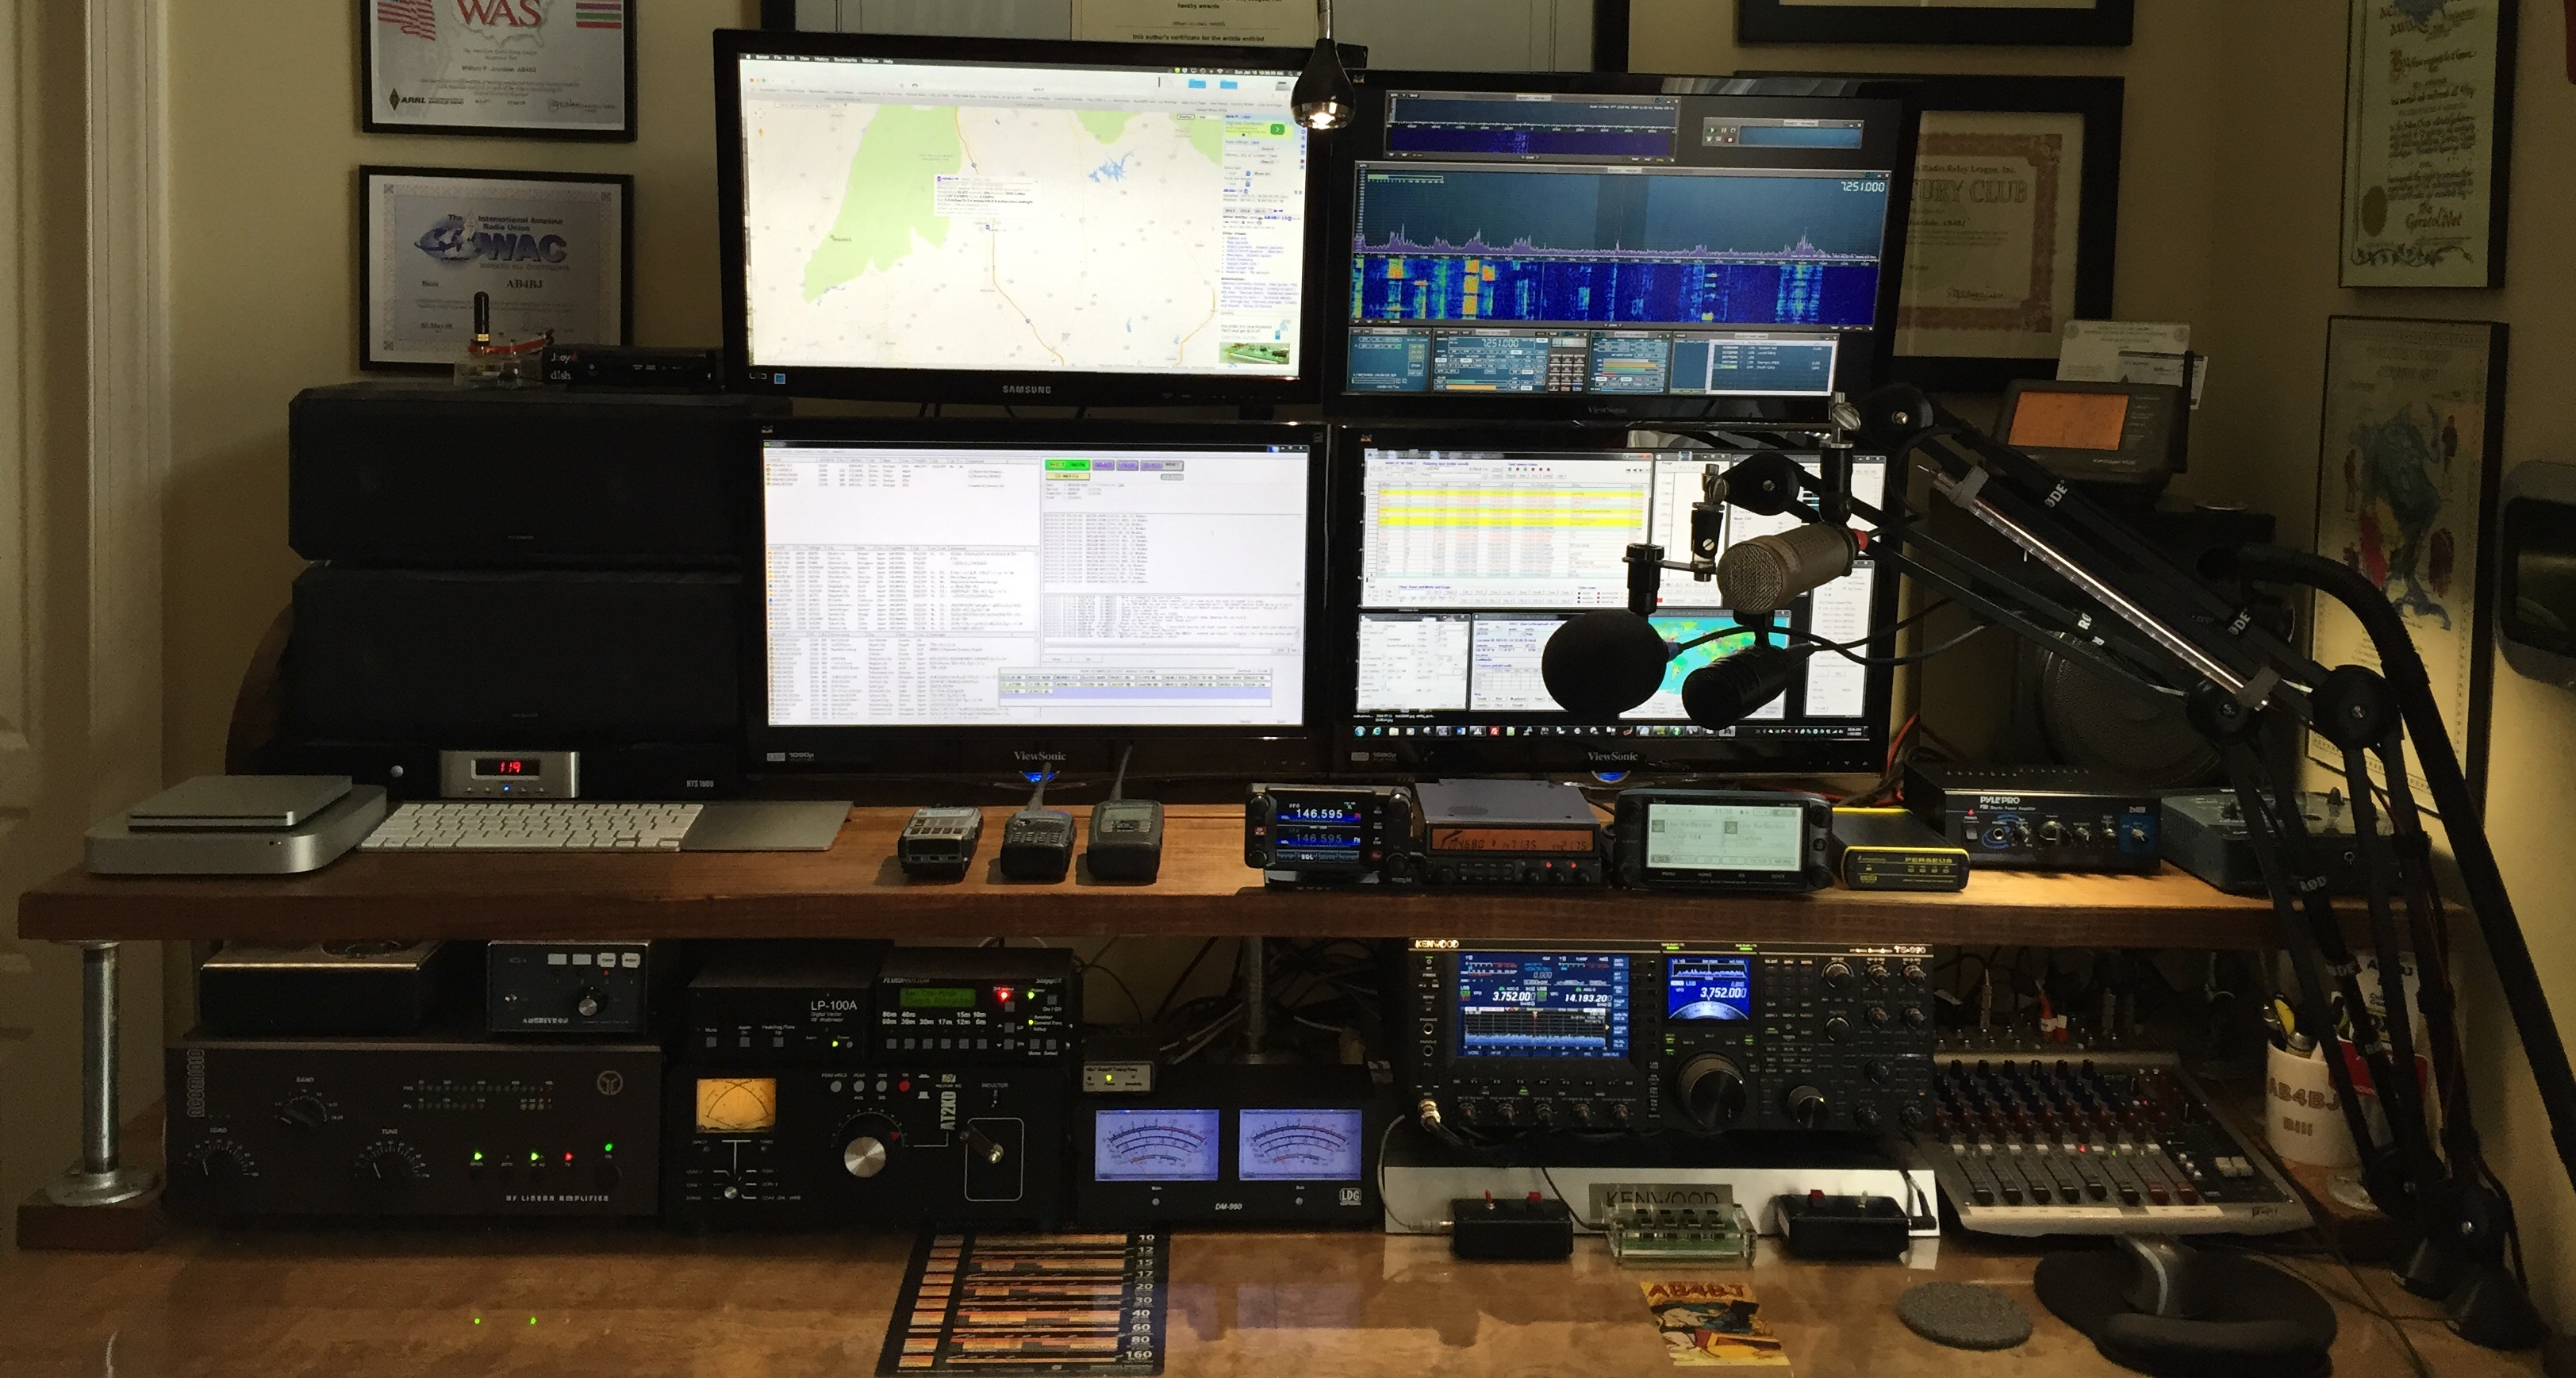 Pity, radio shack amateur radios